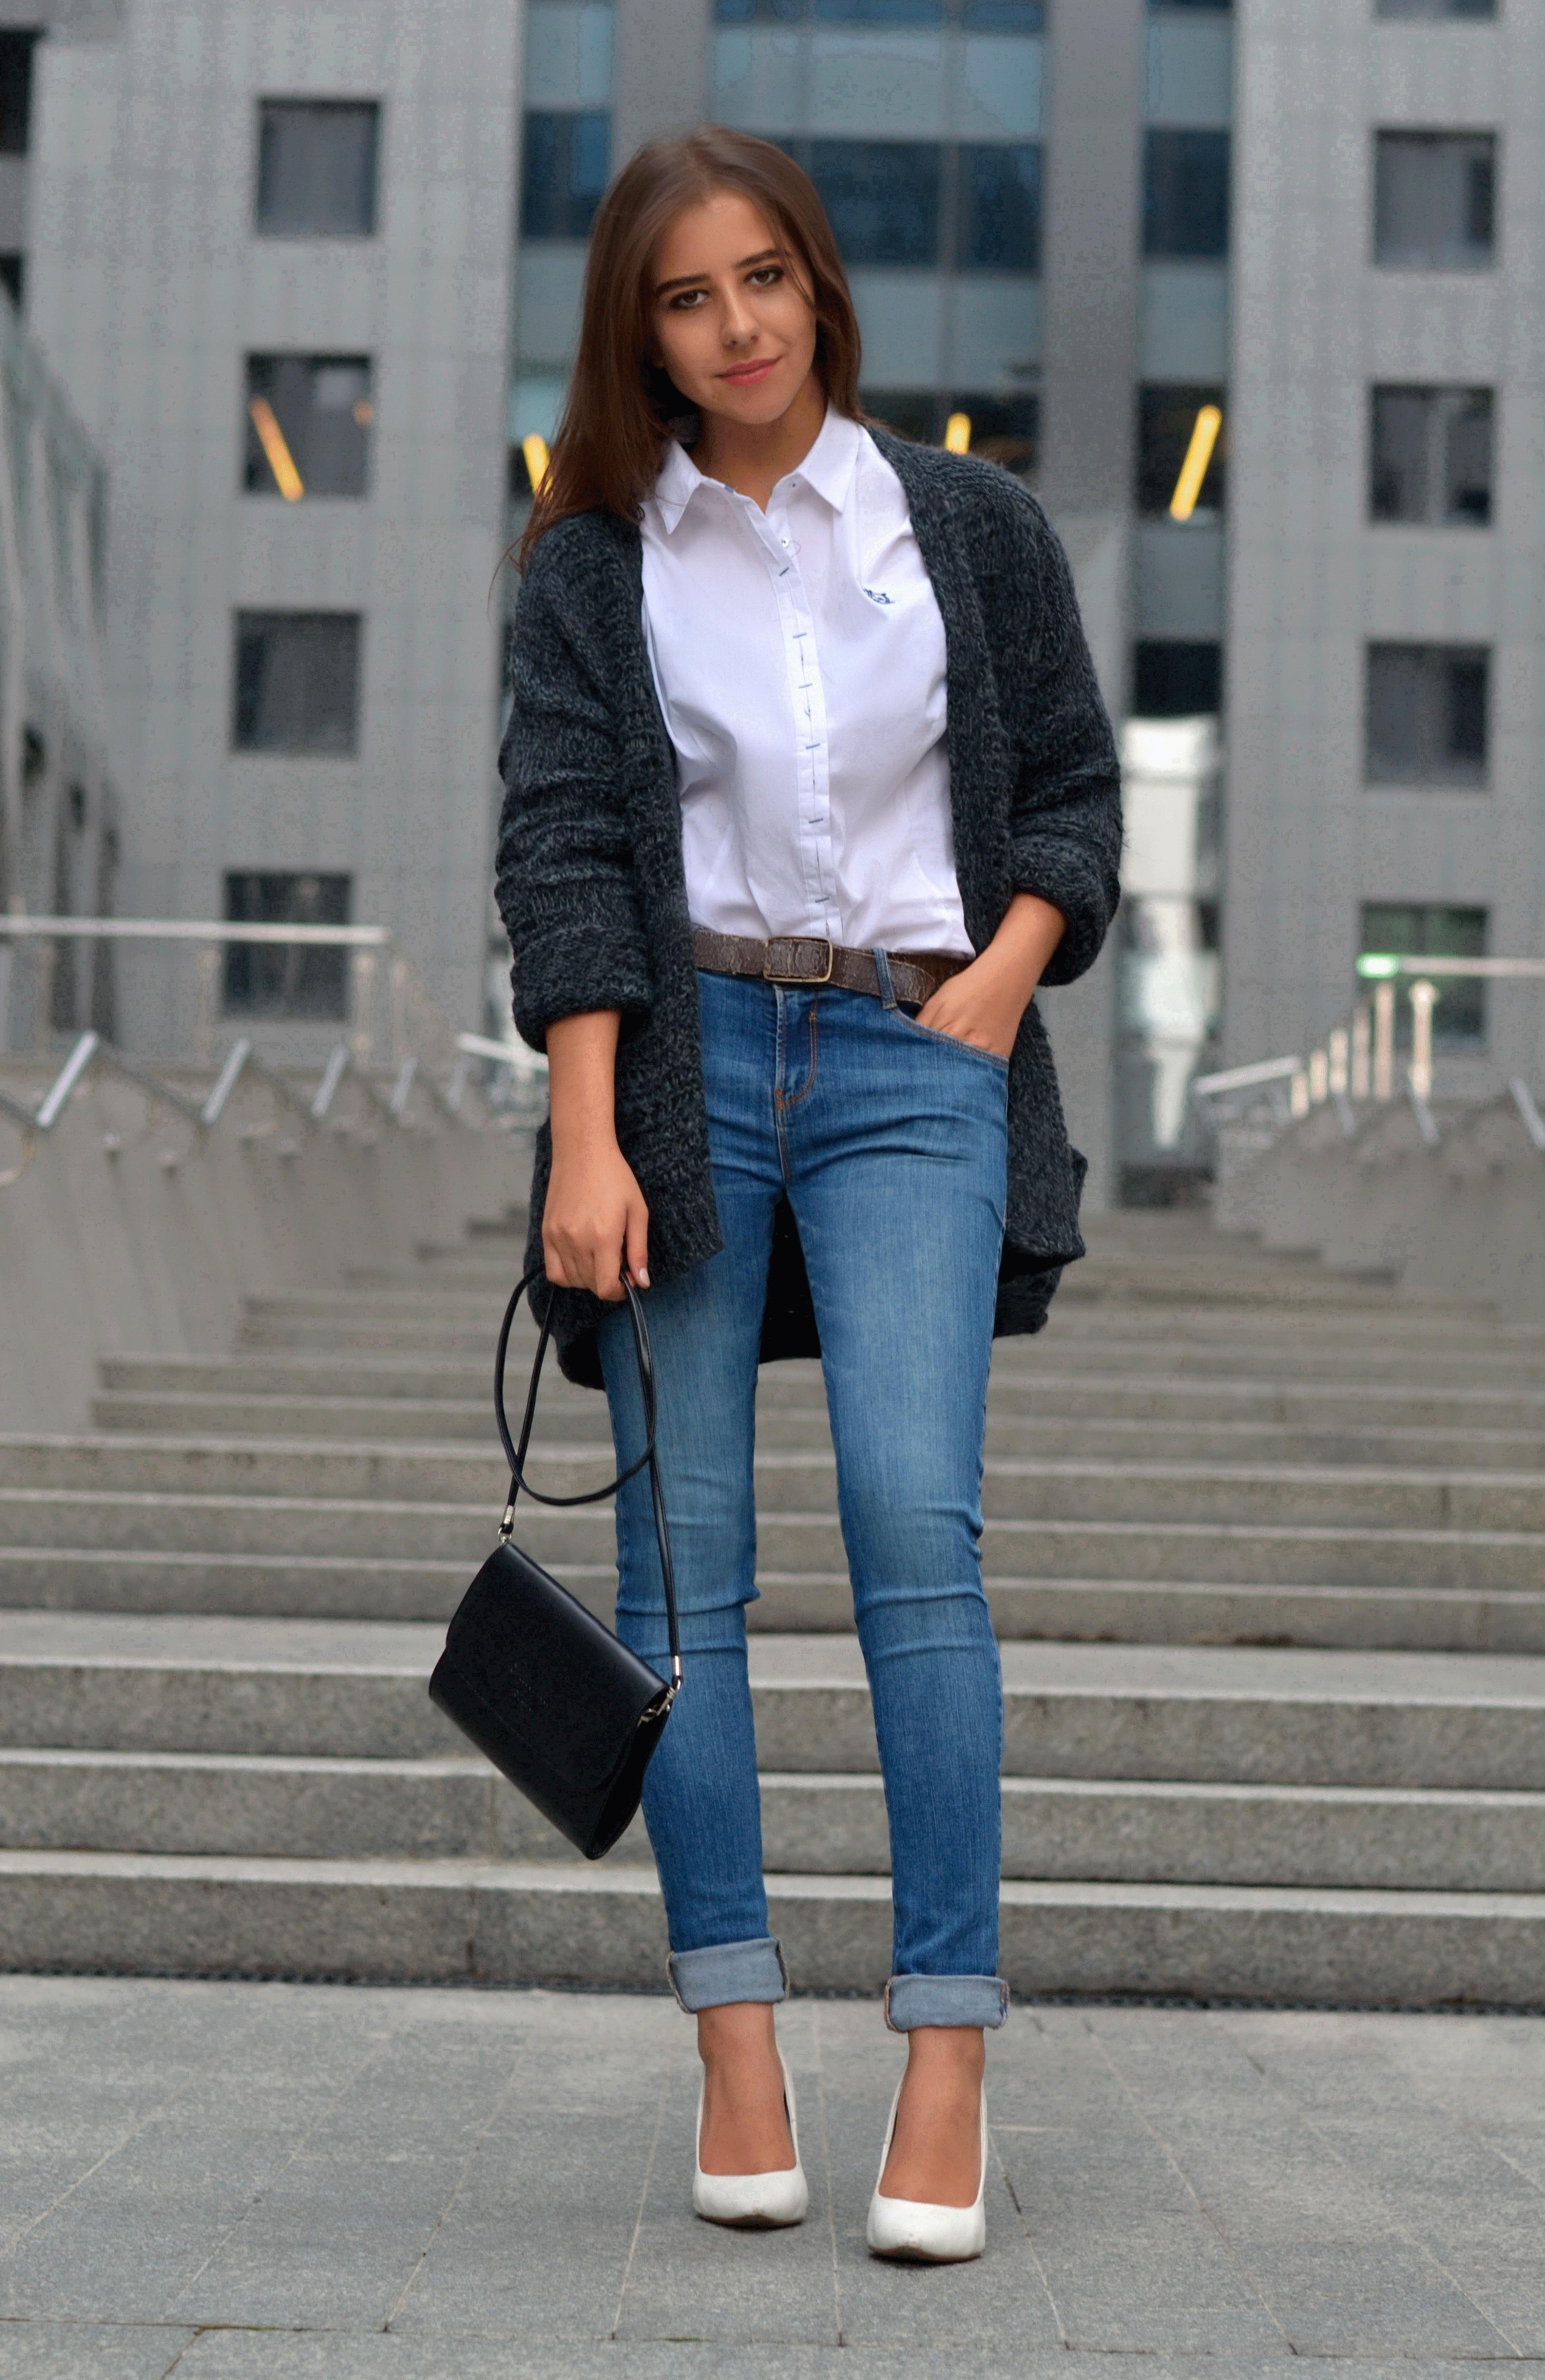 Clutch Skinny Jeans Pumps